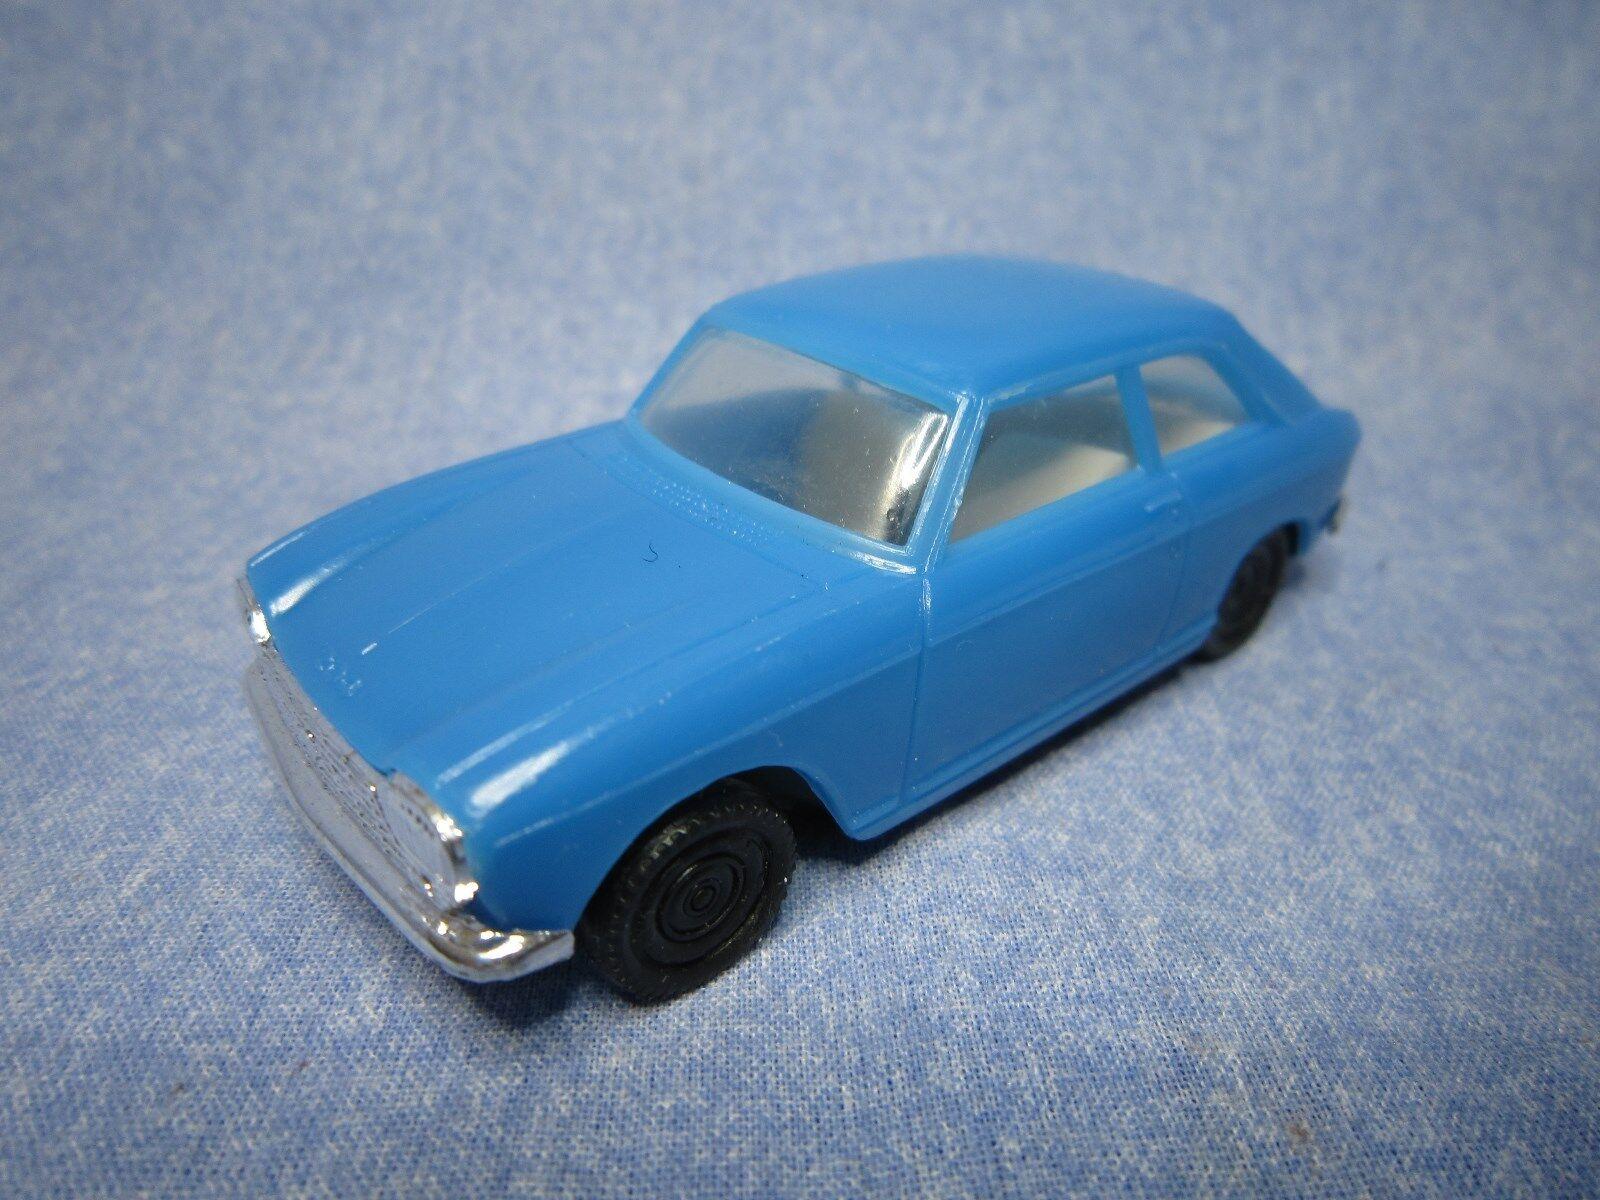 Ae798 injectaplastic 1 43 peugeot 204 coupe bluee etat neuf tres rare